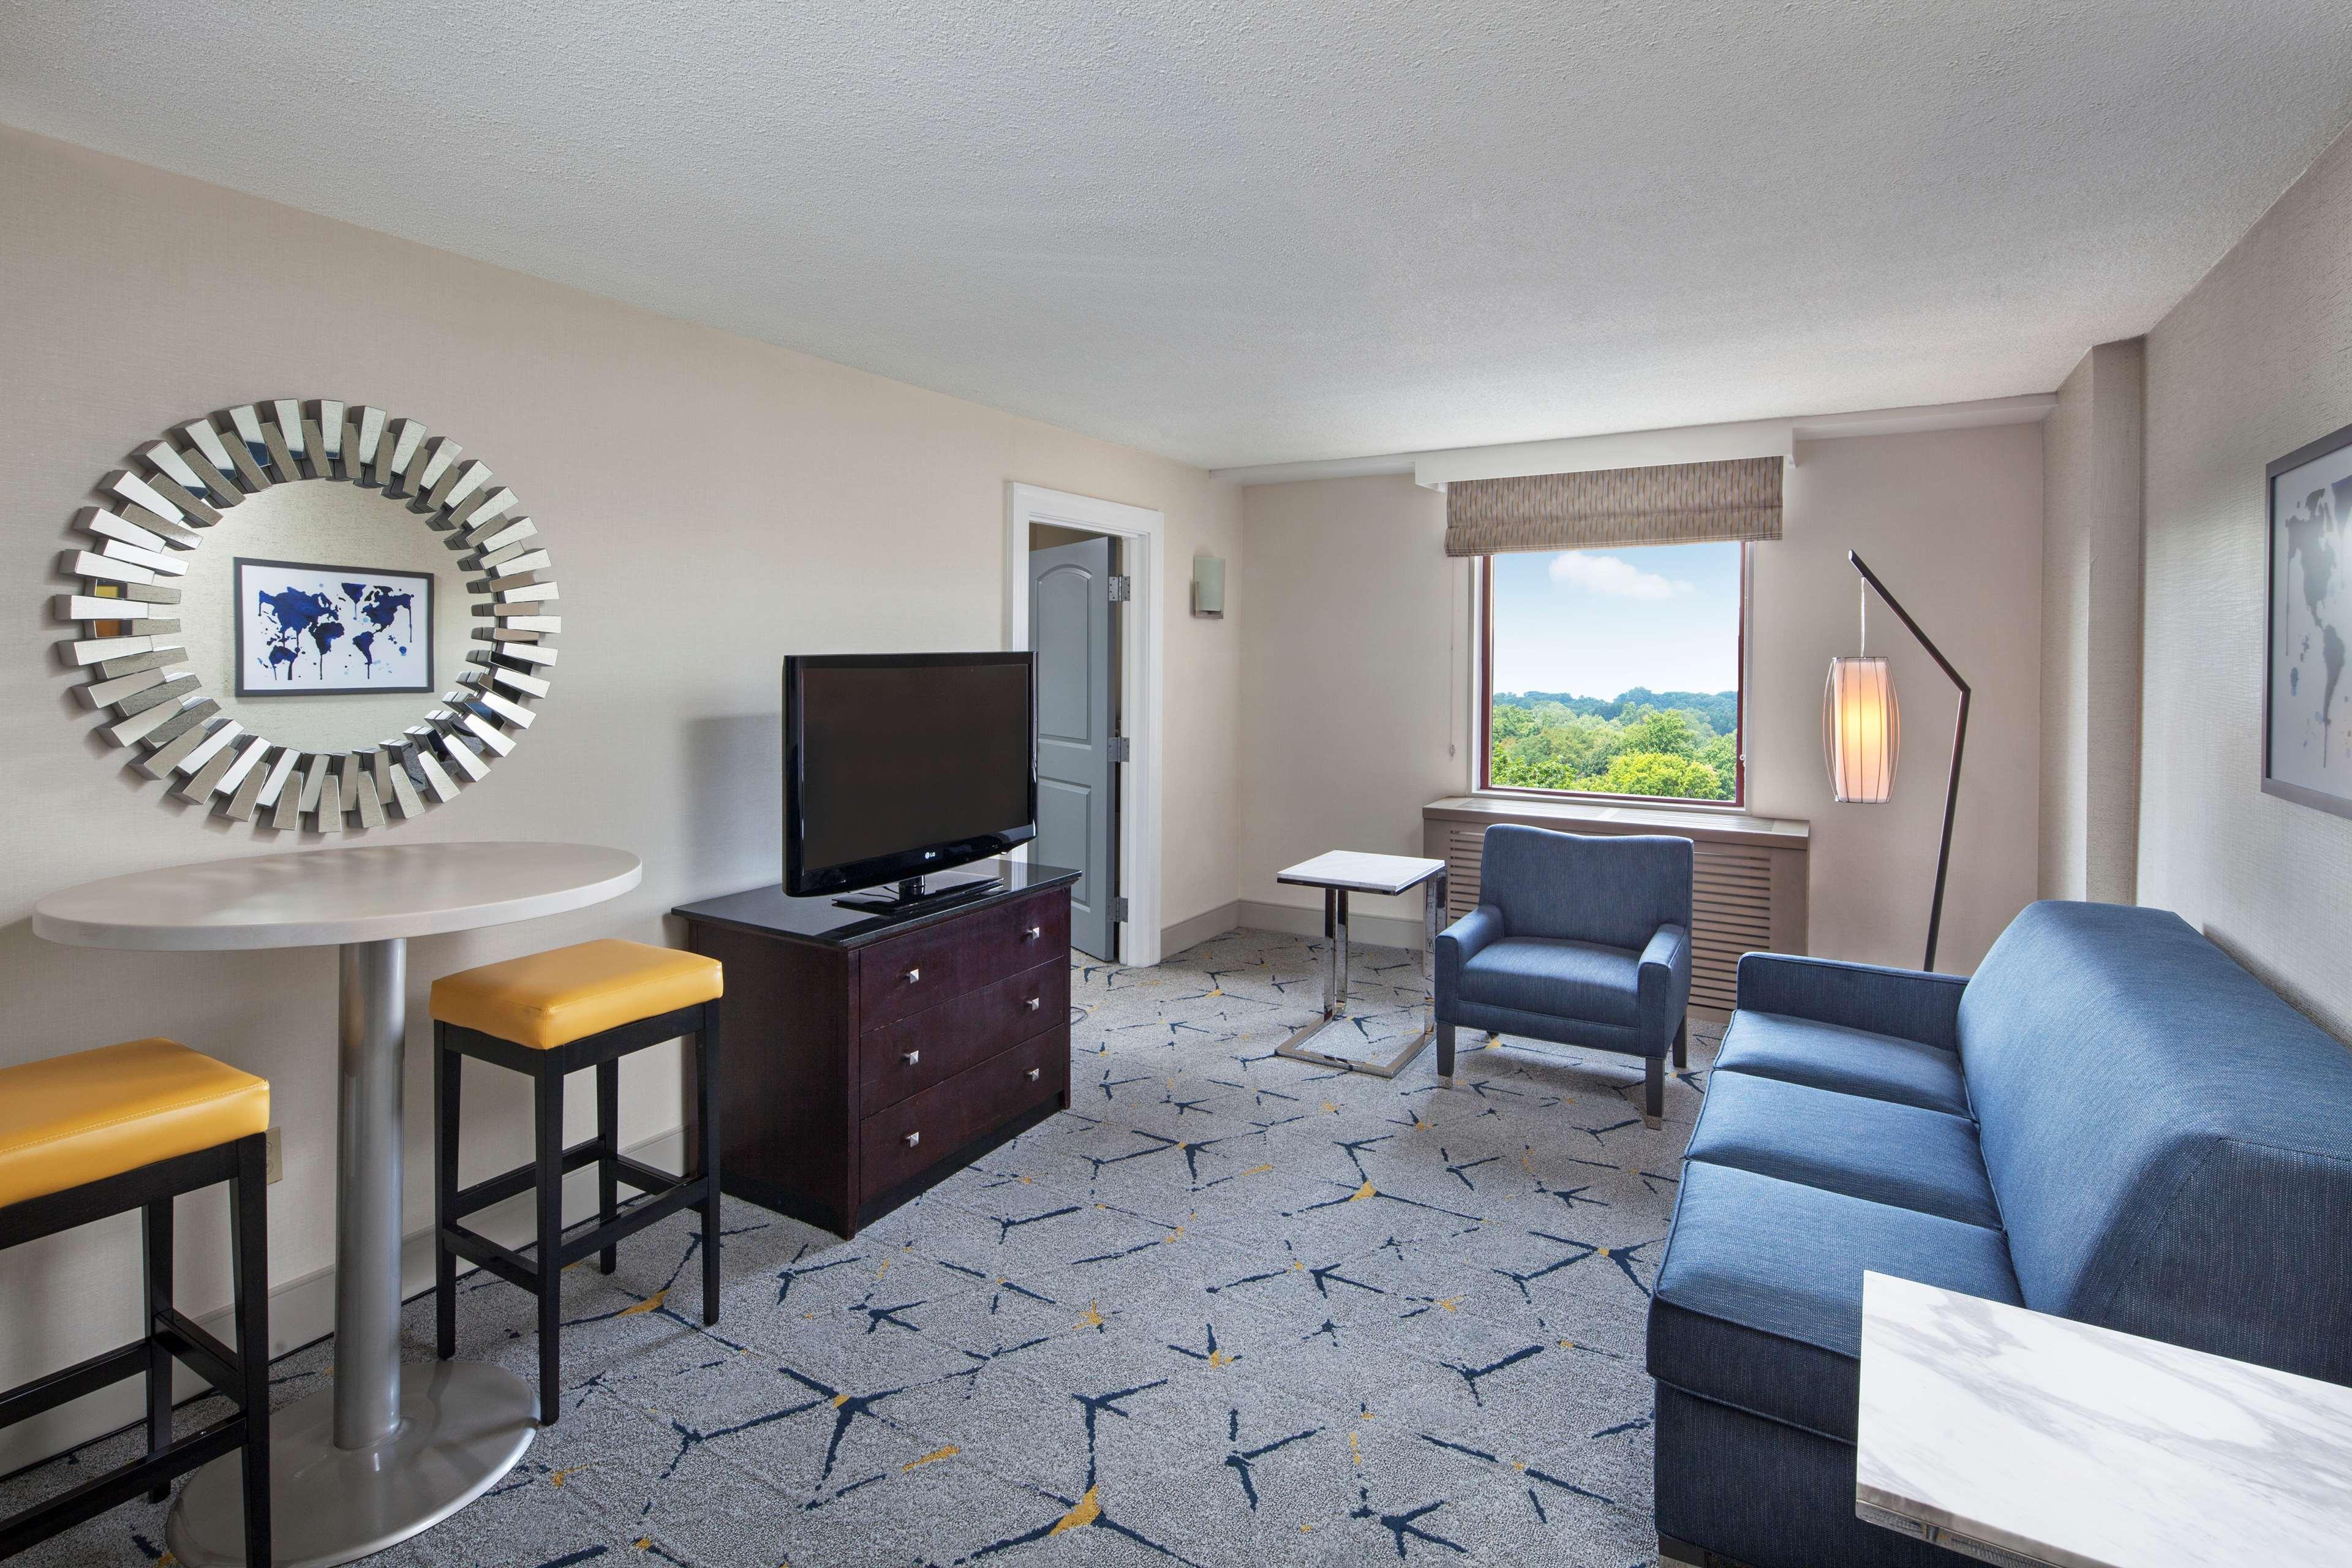 Sheraton Silver Spring Hotel image 6